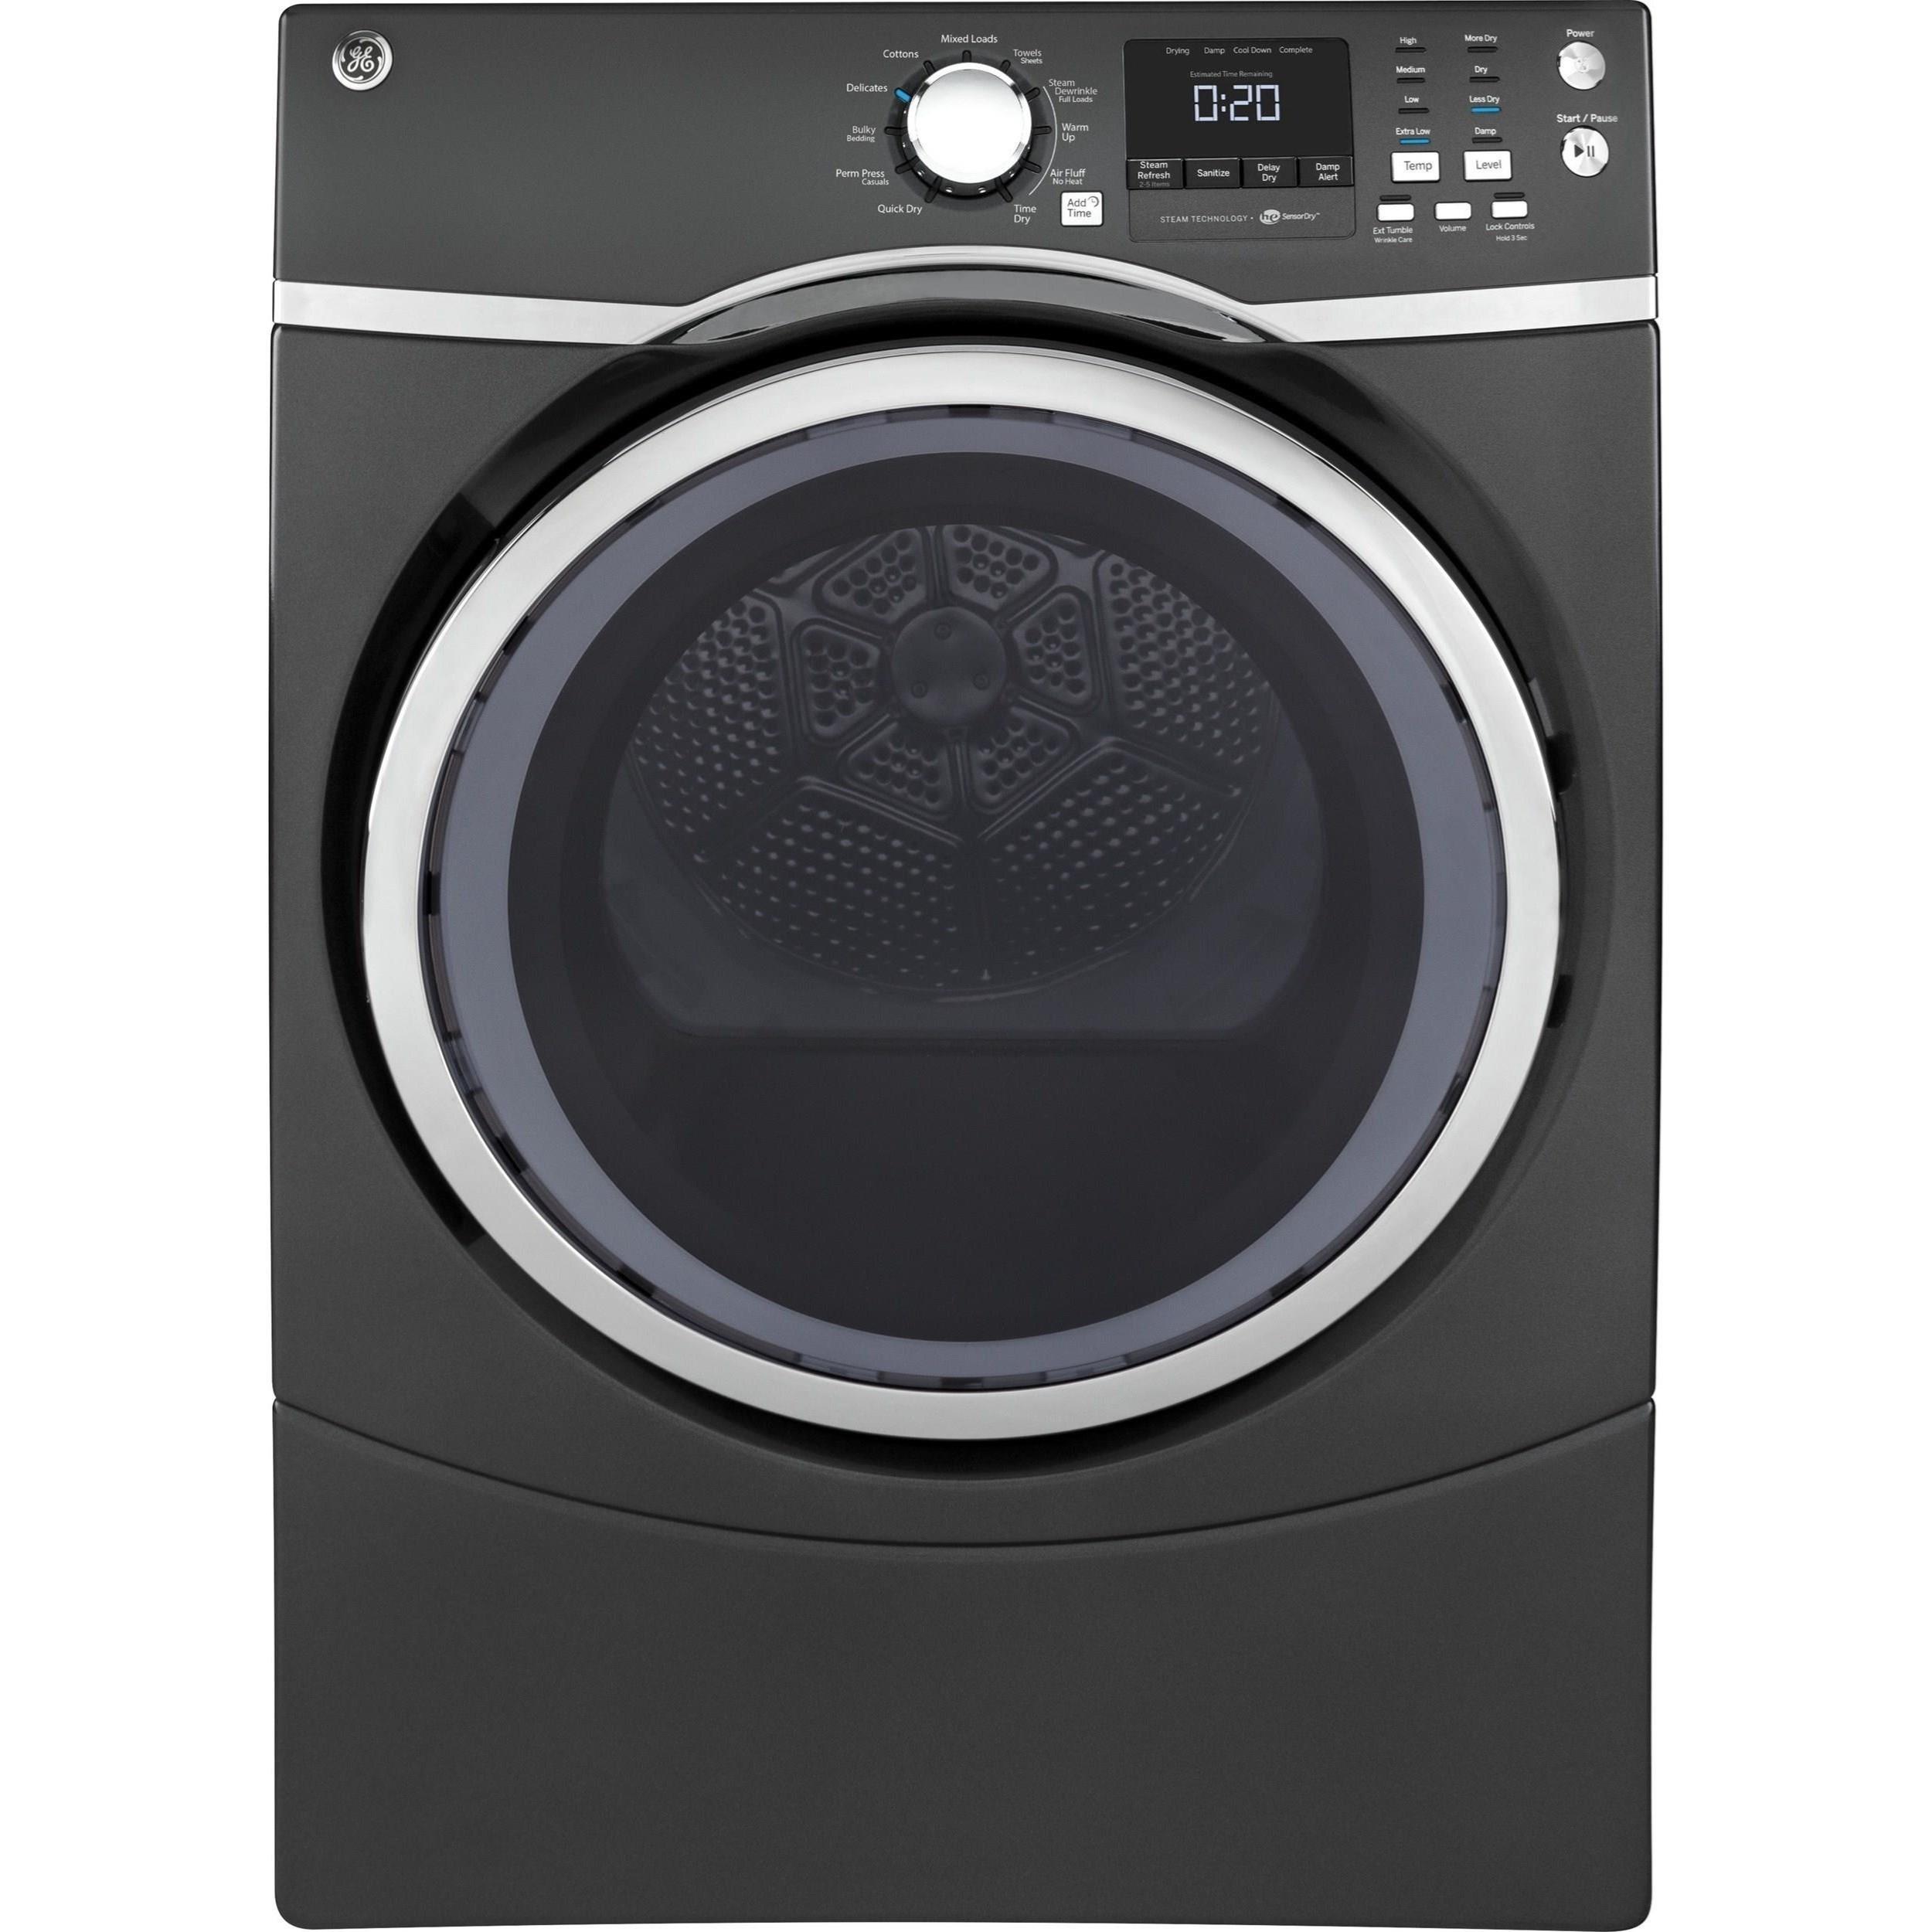 GE Appliances Electric Dryers - GE 8.3 Cu.Ft. Electric Steam Dryer - Item Number: GFD49ERPKDG